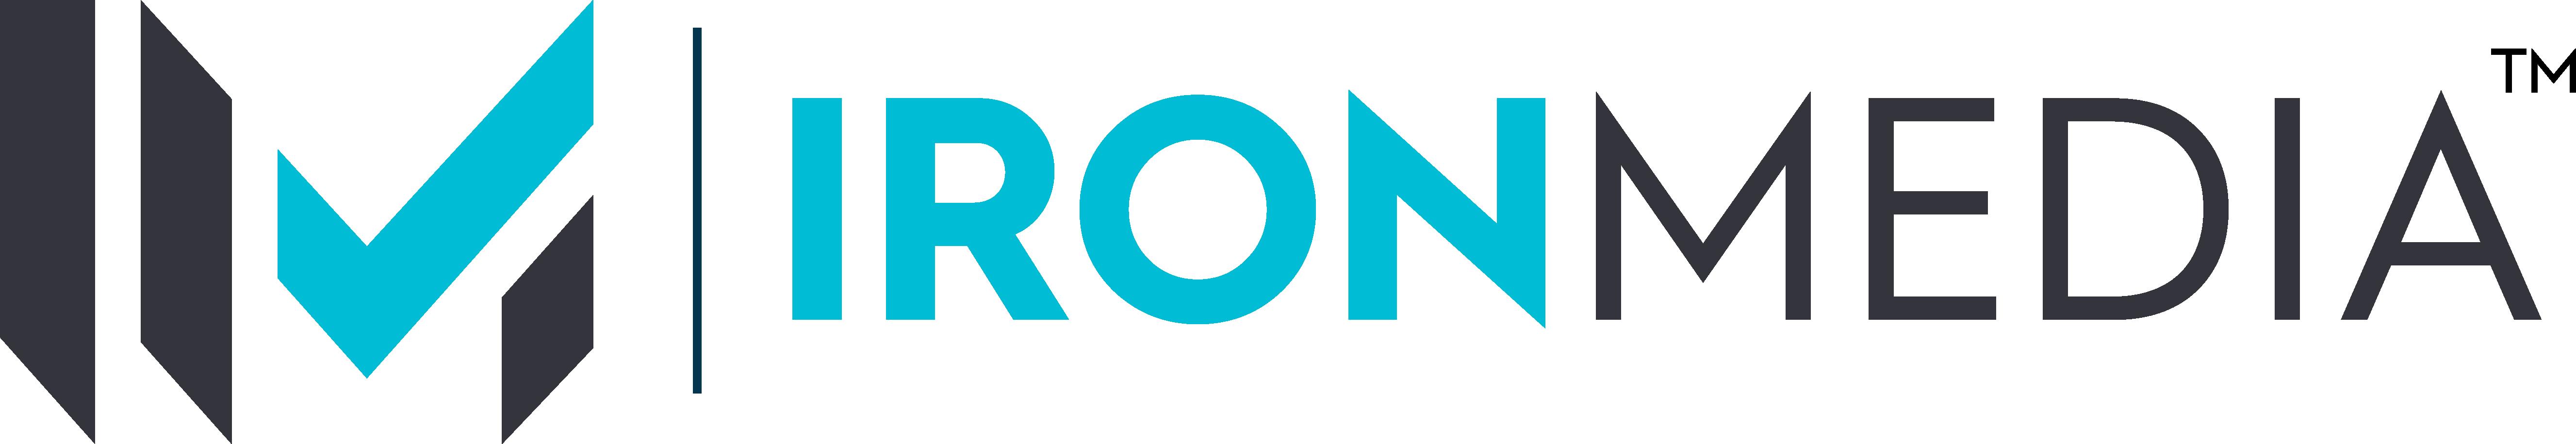 Iron Media